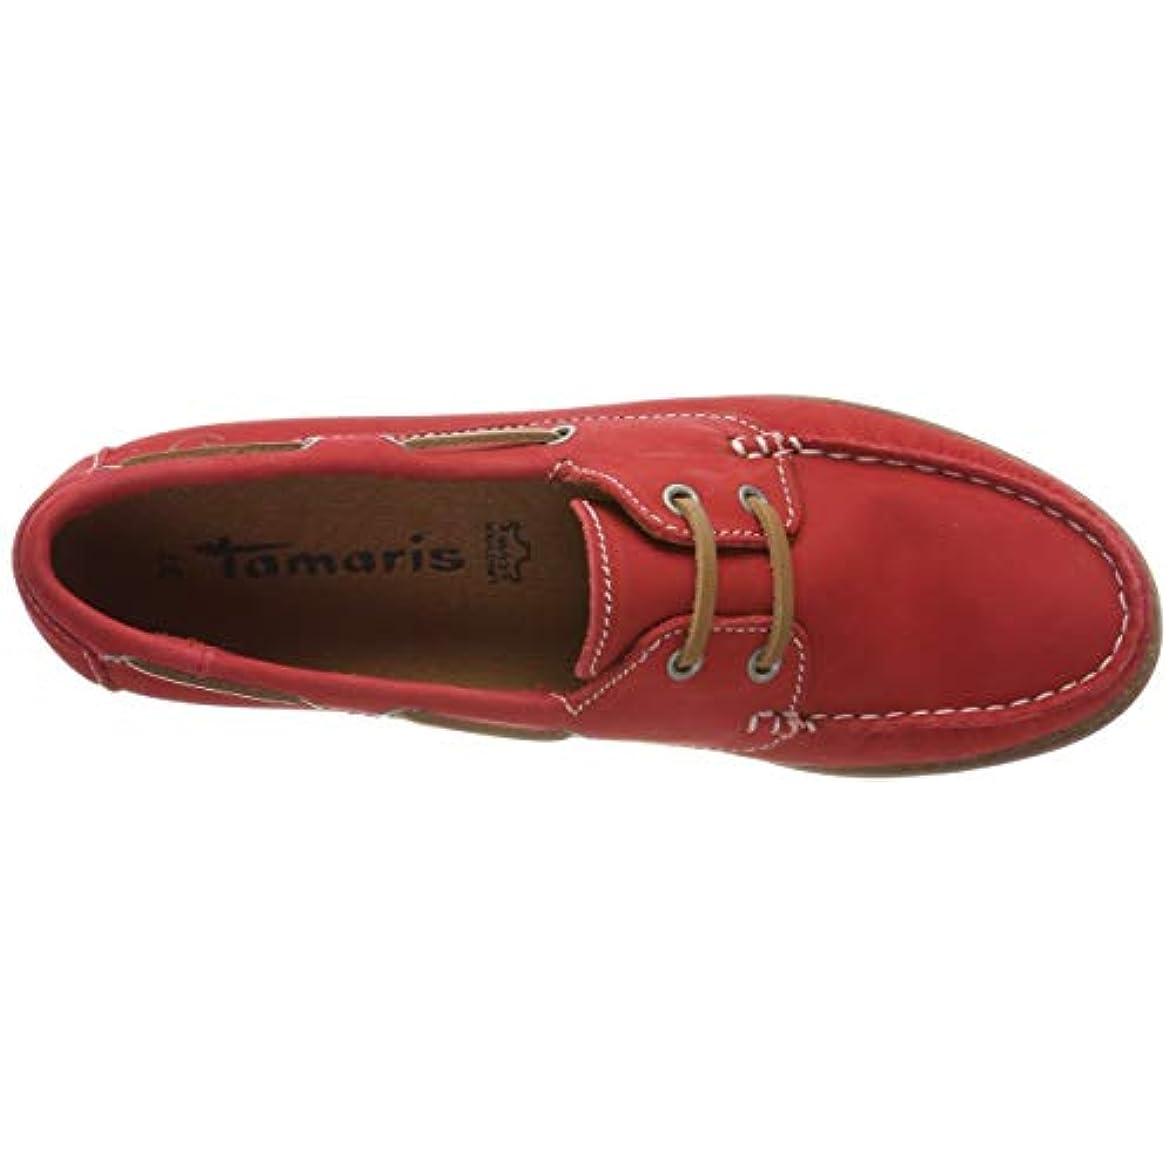 Ginnastica Basse 601 Tamaris Scarpe 1-1-23616-22 Da Donna